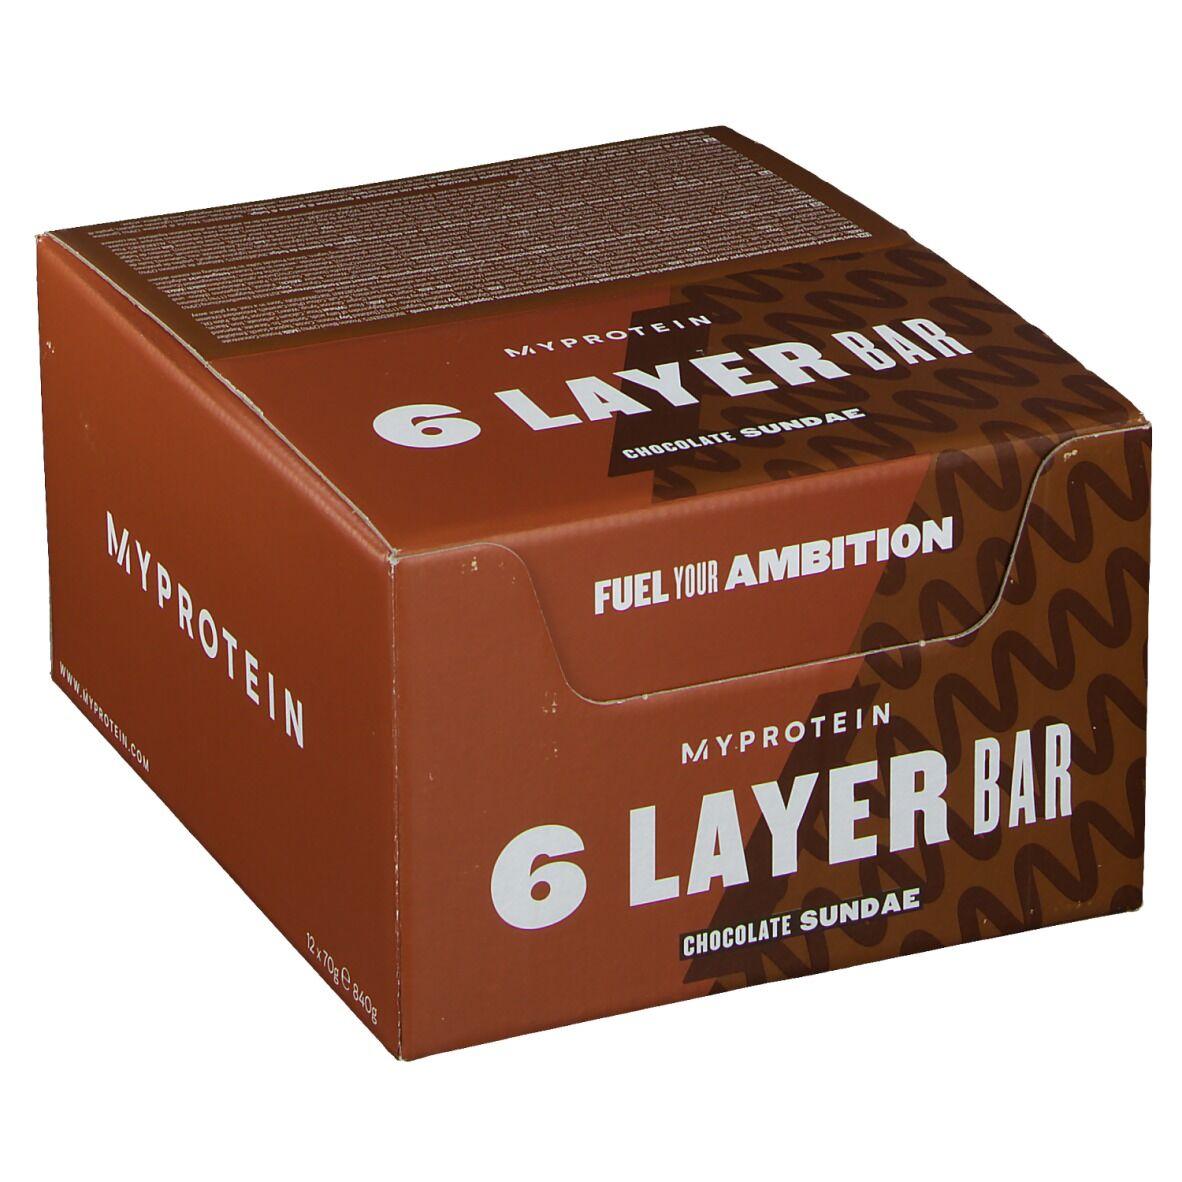 MyProtein® 6 Layer Bar Chocolate Sundae g barre(s)